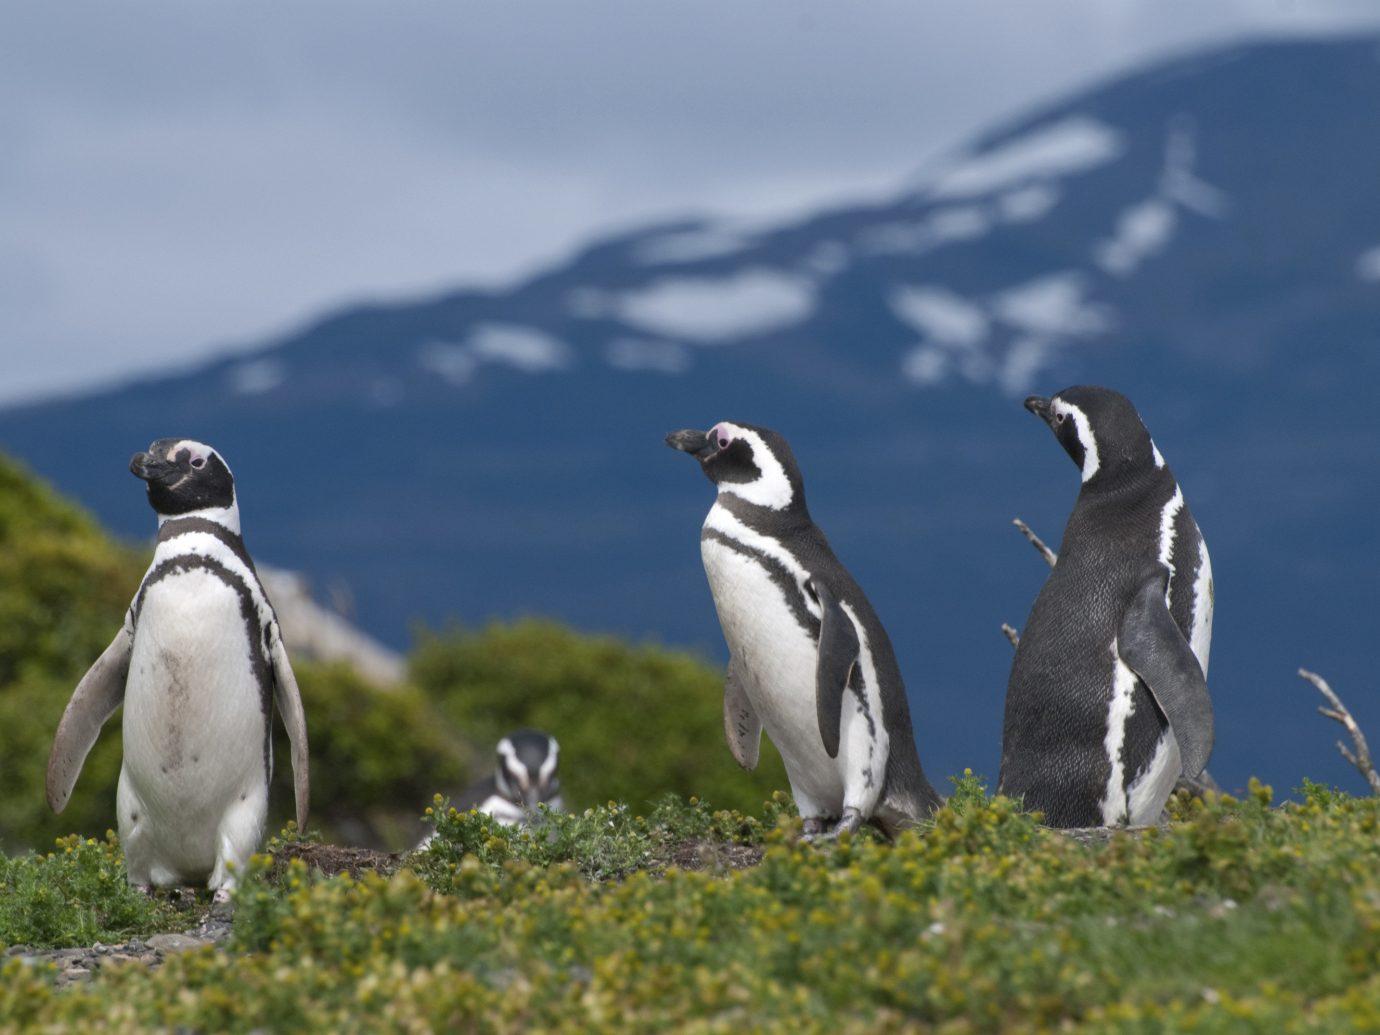 Trip Ideas outdoor Bird animal aquatic bird grass penguin flightless bird vertebrate standing fauna Wildlife hillside